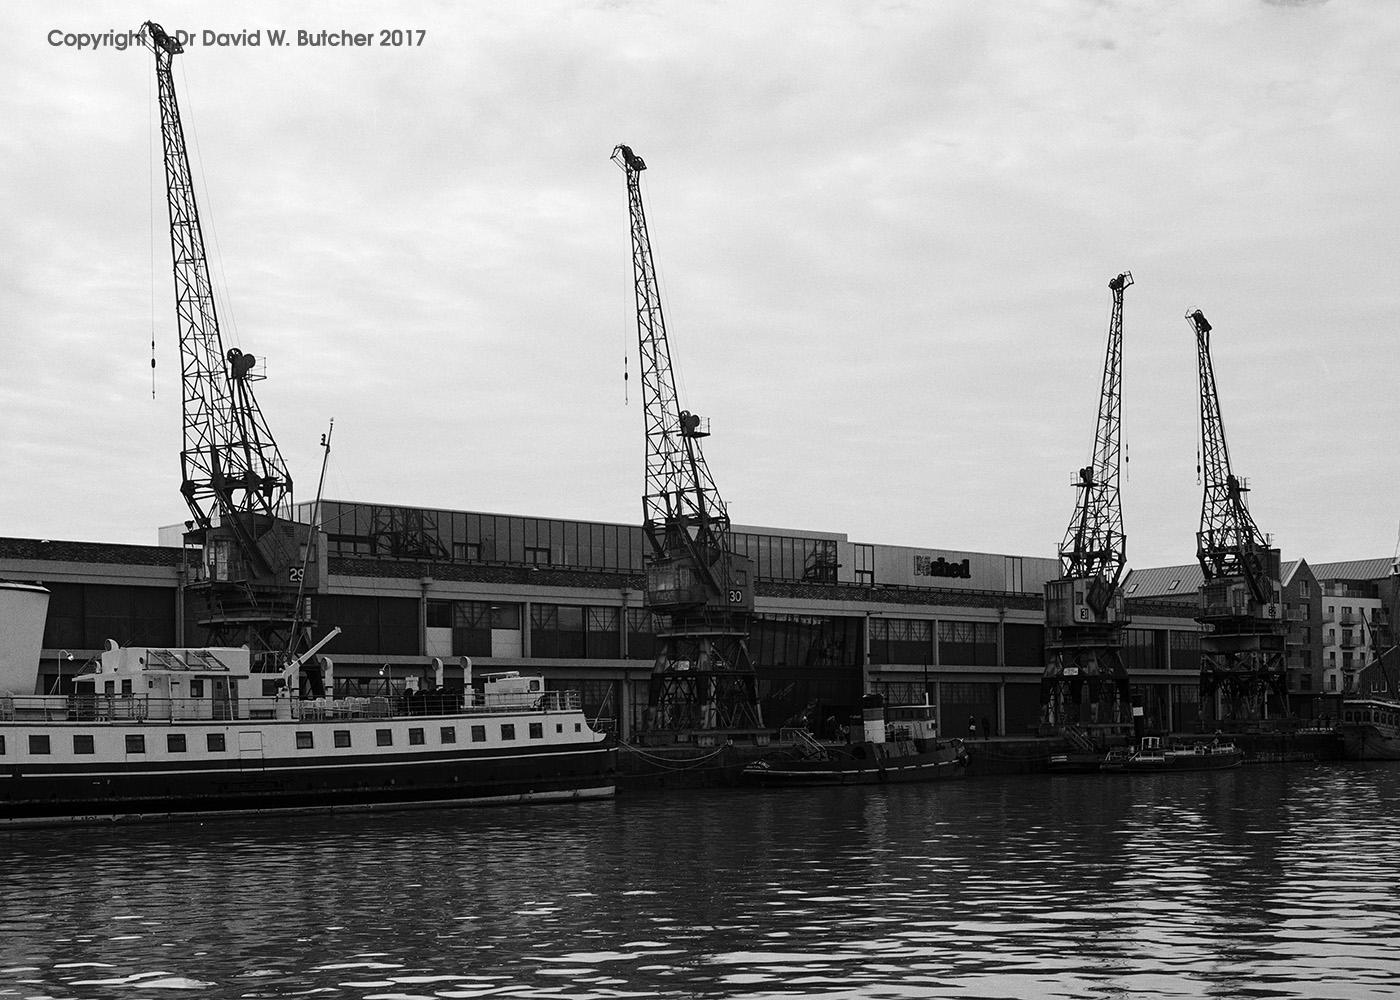 Bristol M Shed Cranes, England